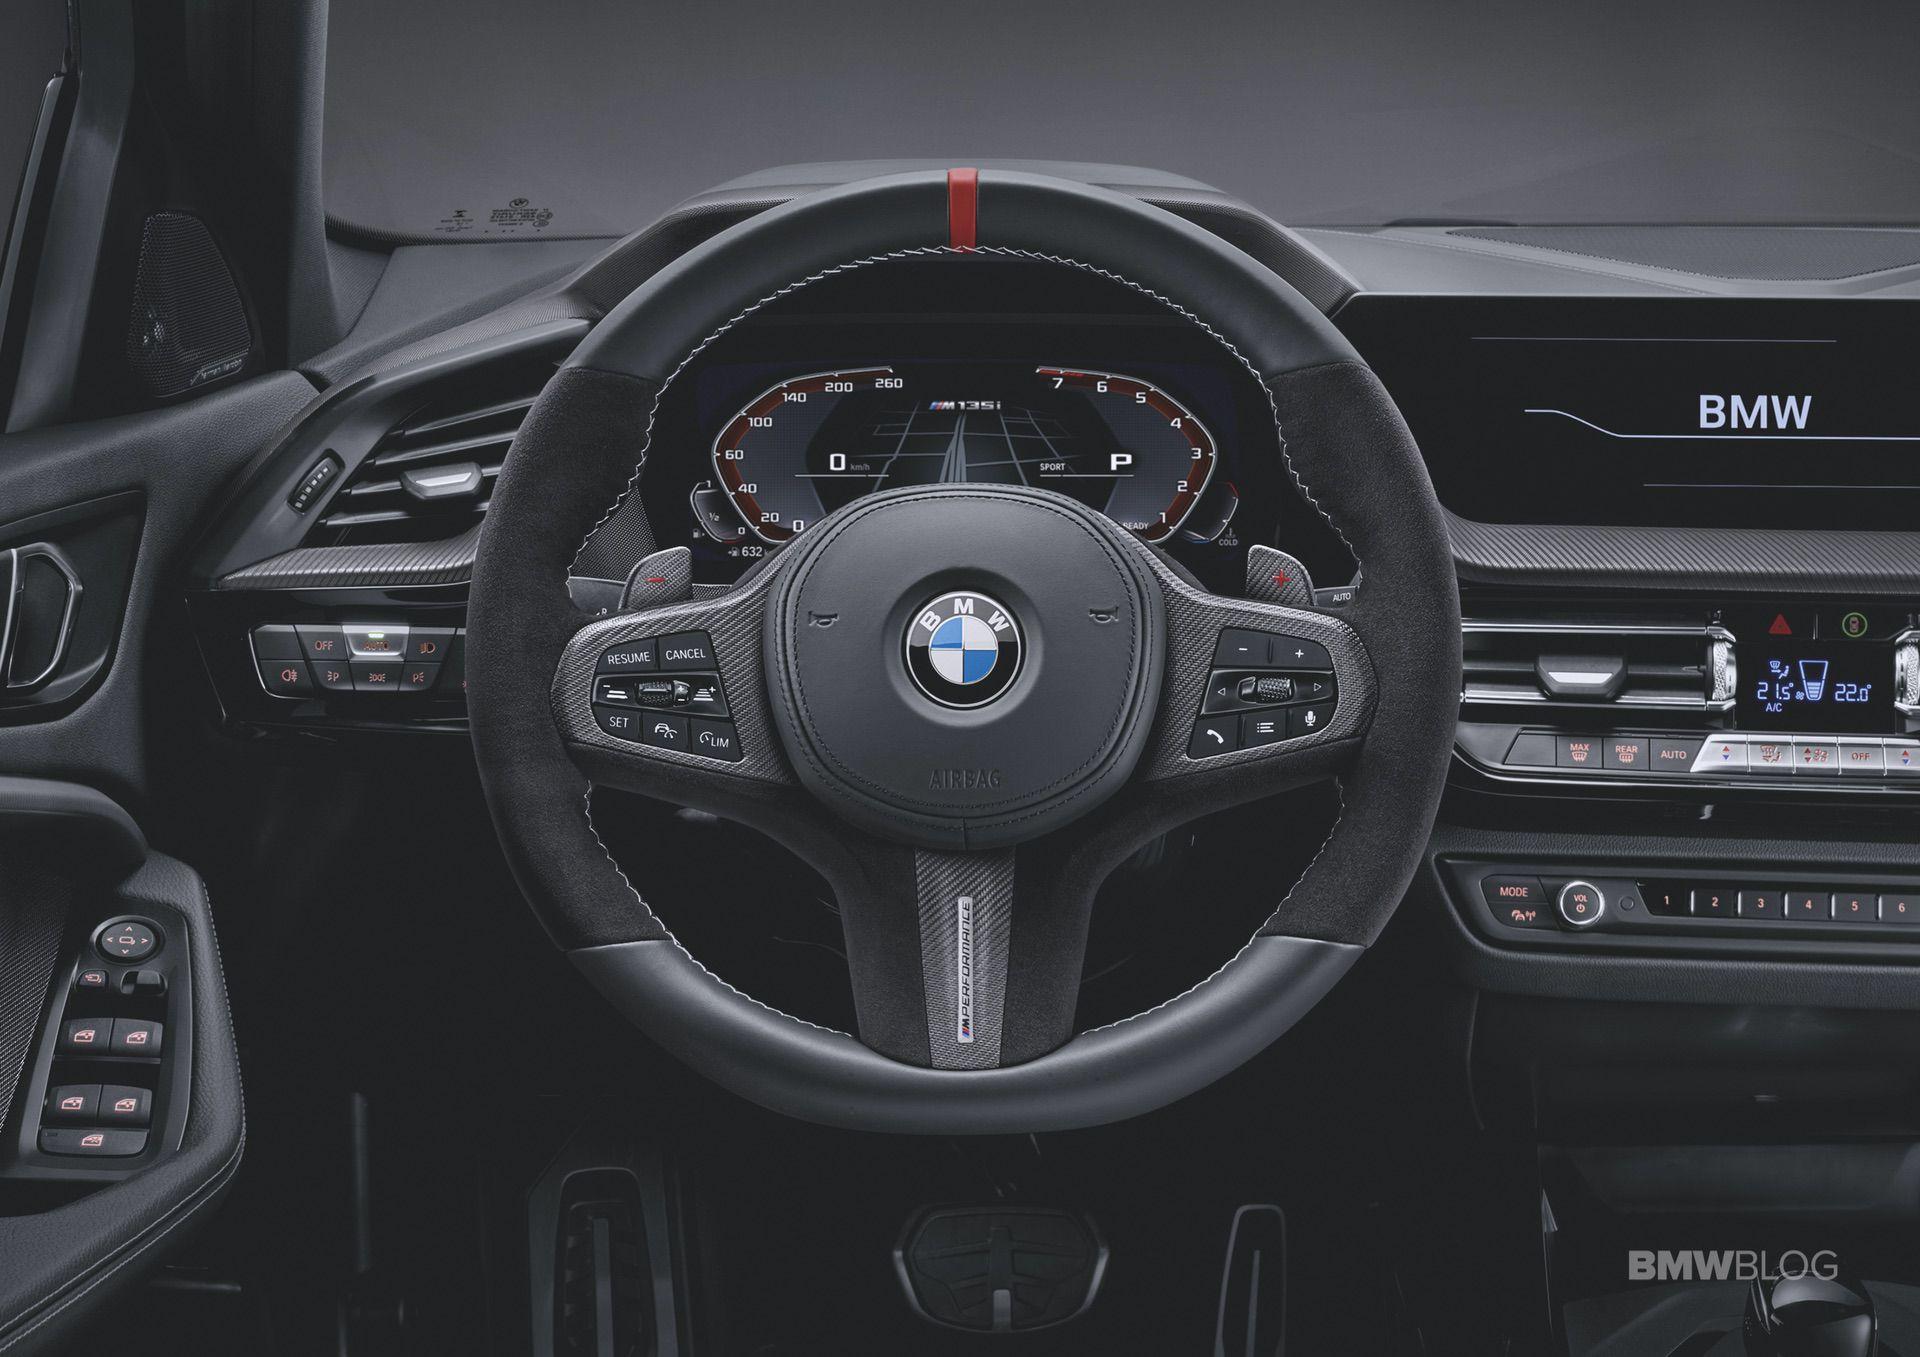 BMW-1-Series-M-Performance-Parts-07.jpg